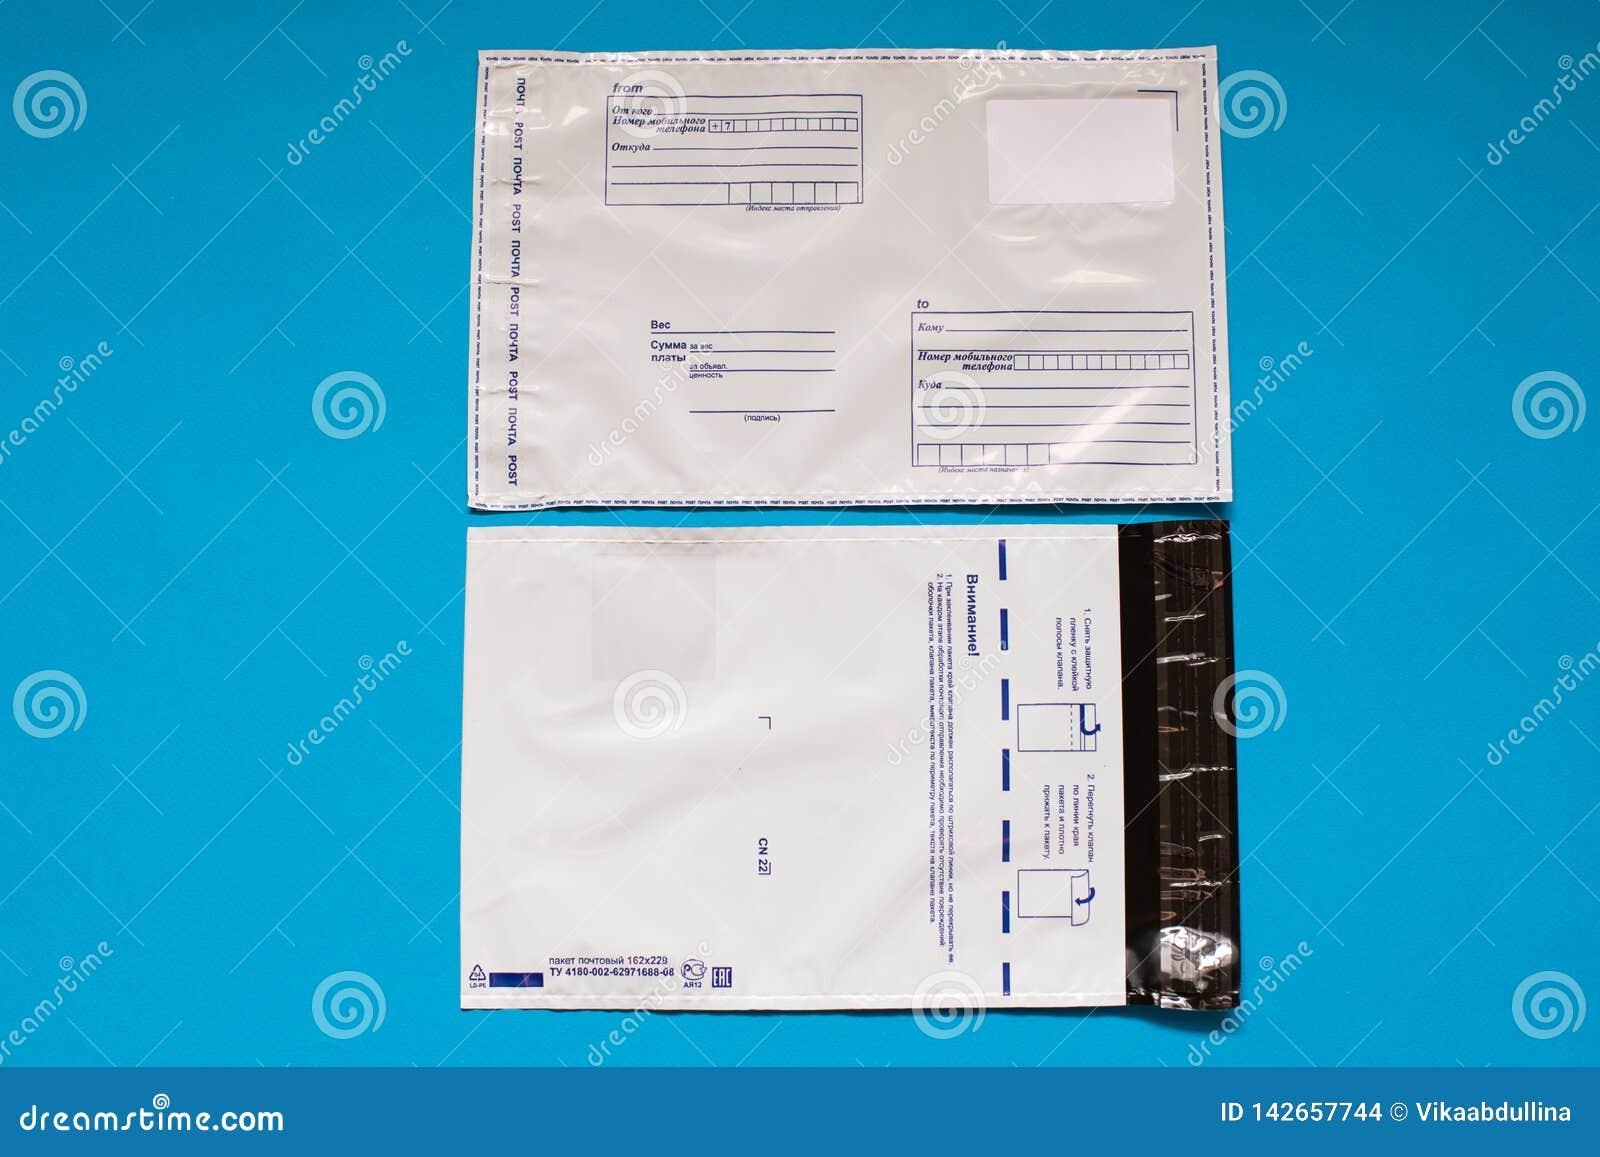 Russian post polyethylene envelope on blue background. Plastic Postal Mailing Bags